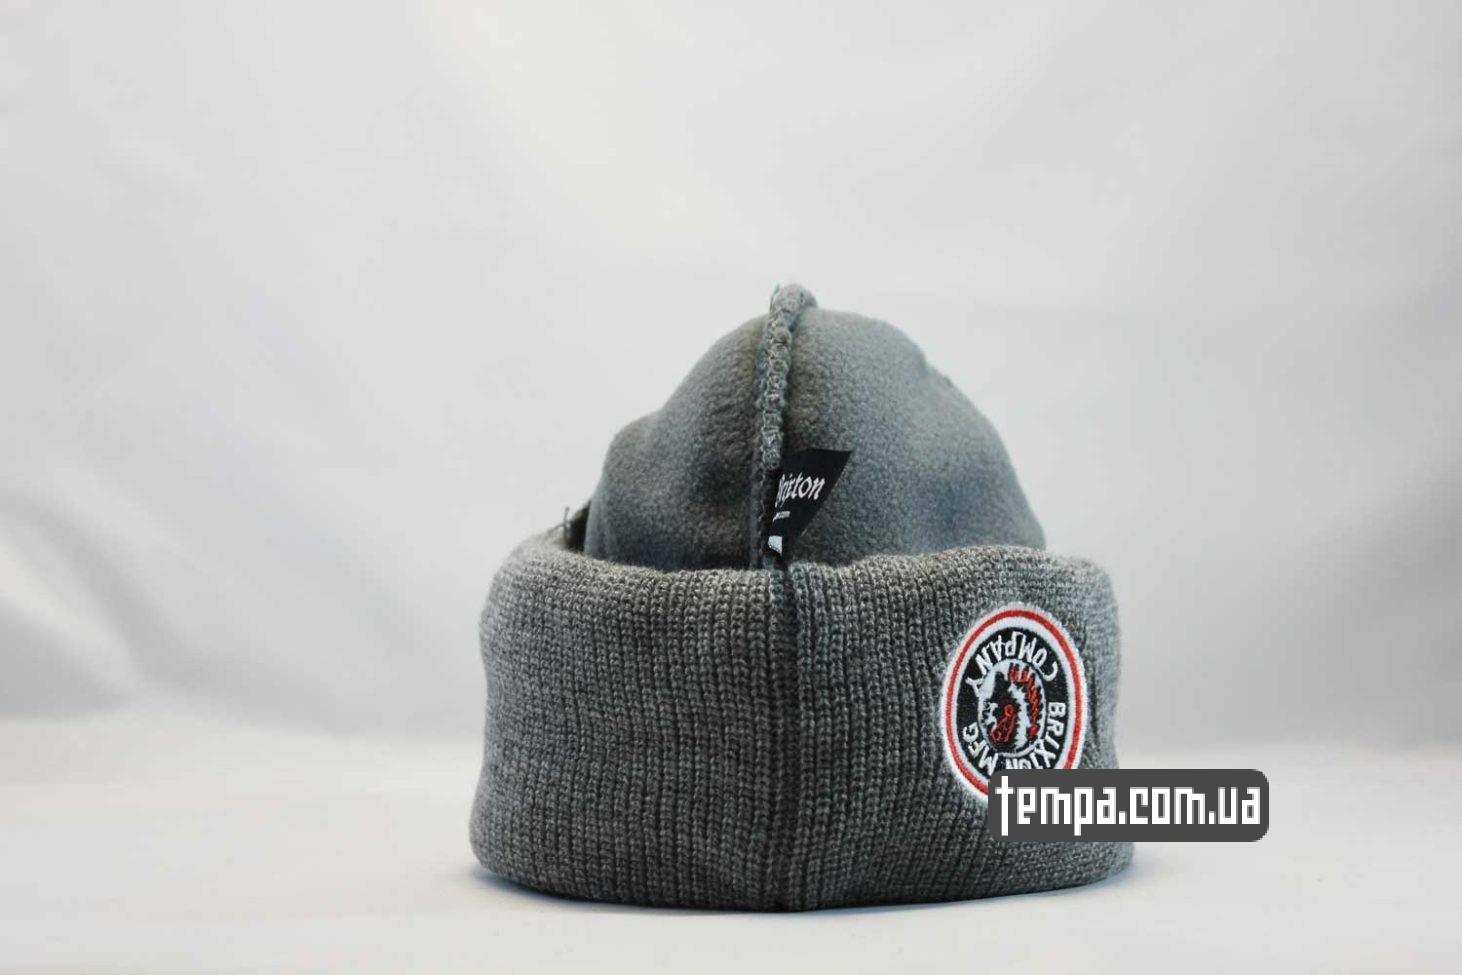 теплая зимняя двойная шапка beanie BRIXTON MFG CO серая indian с индейцем